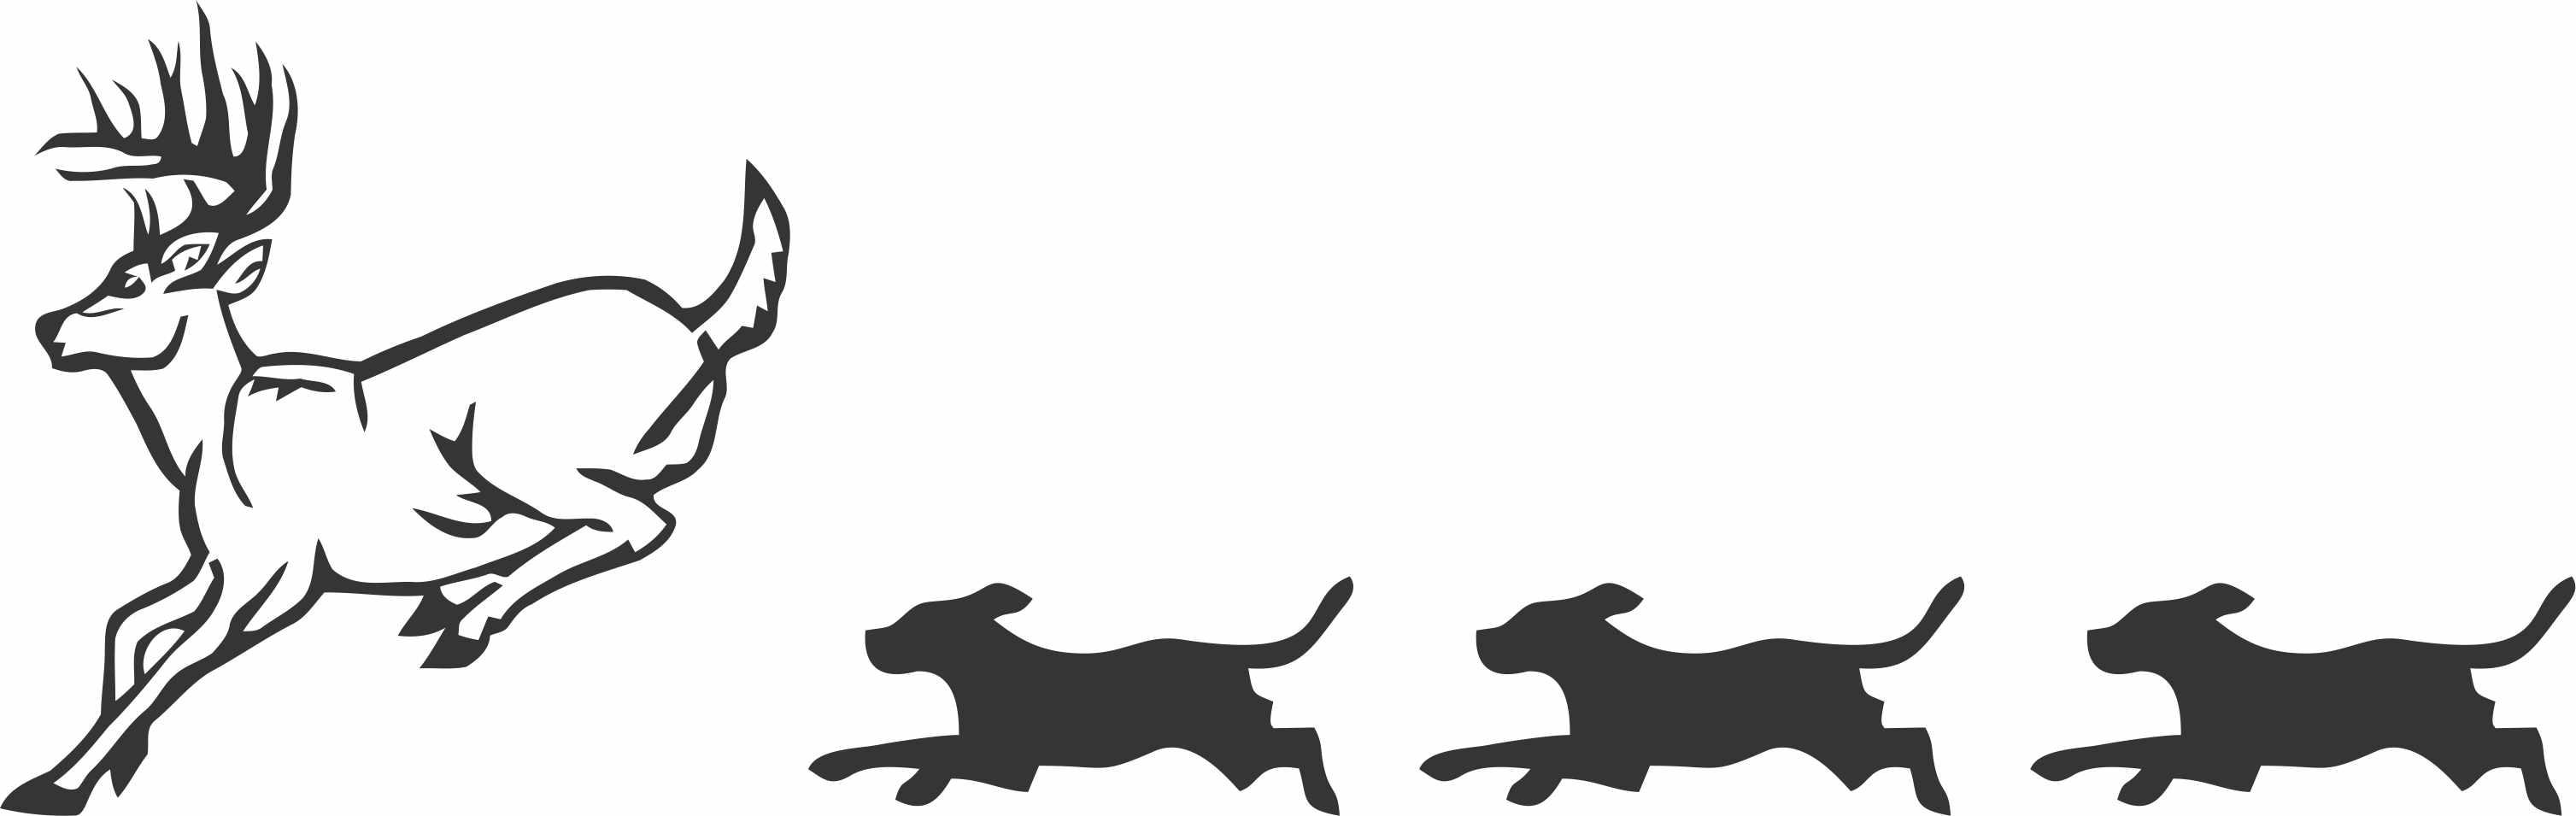 Beagle clipart beagle hunting. Free cliparts download clip